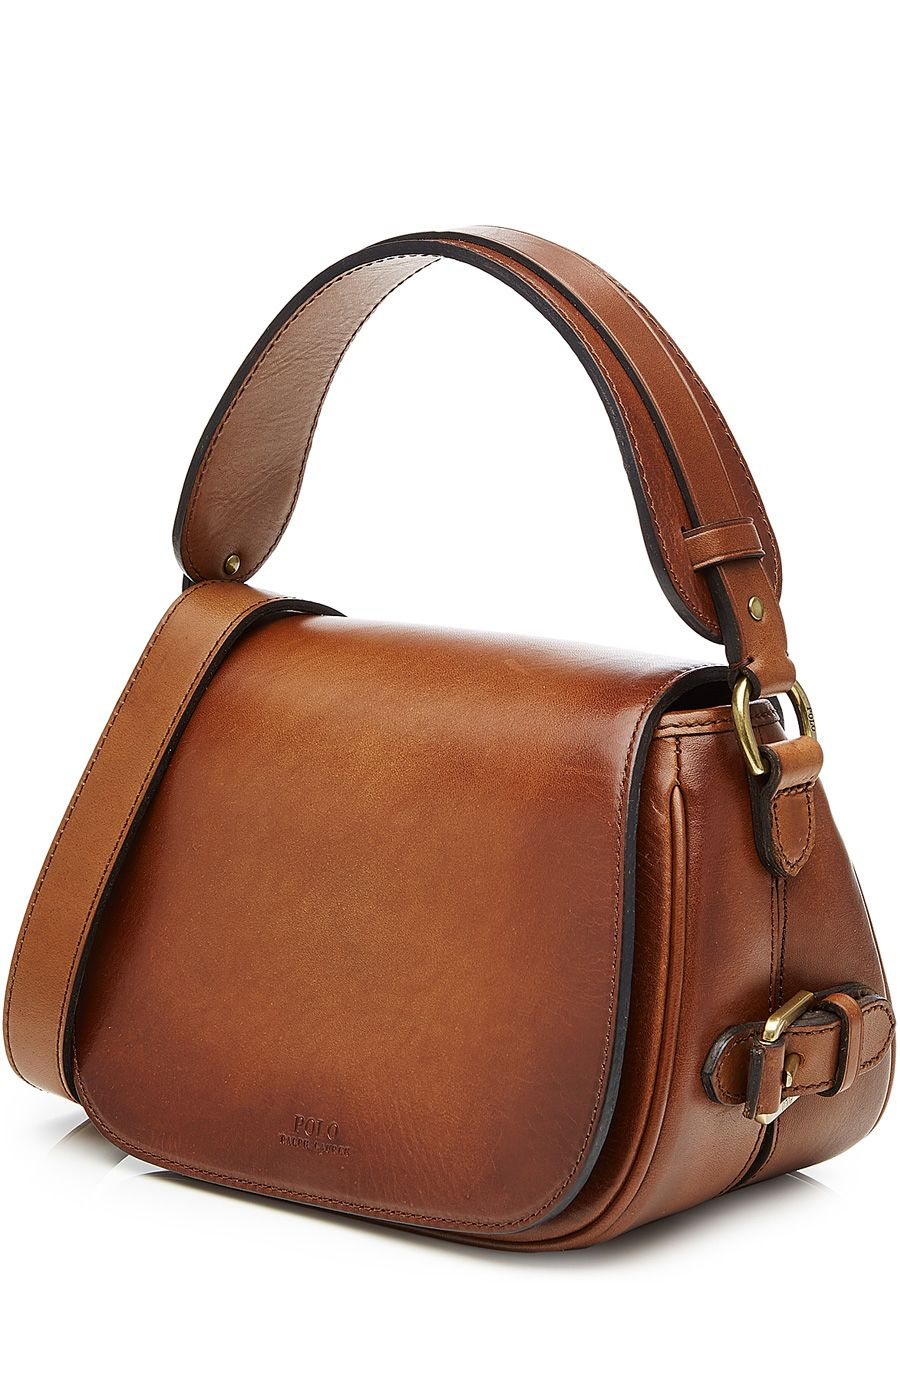 62649382e4e6 Polo Ralph Lauren Small Sullivan Saddle Bag   Fashion   Ralph lauren ...